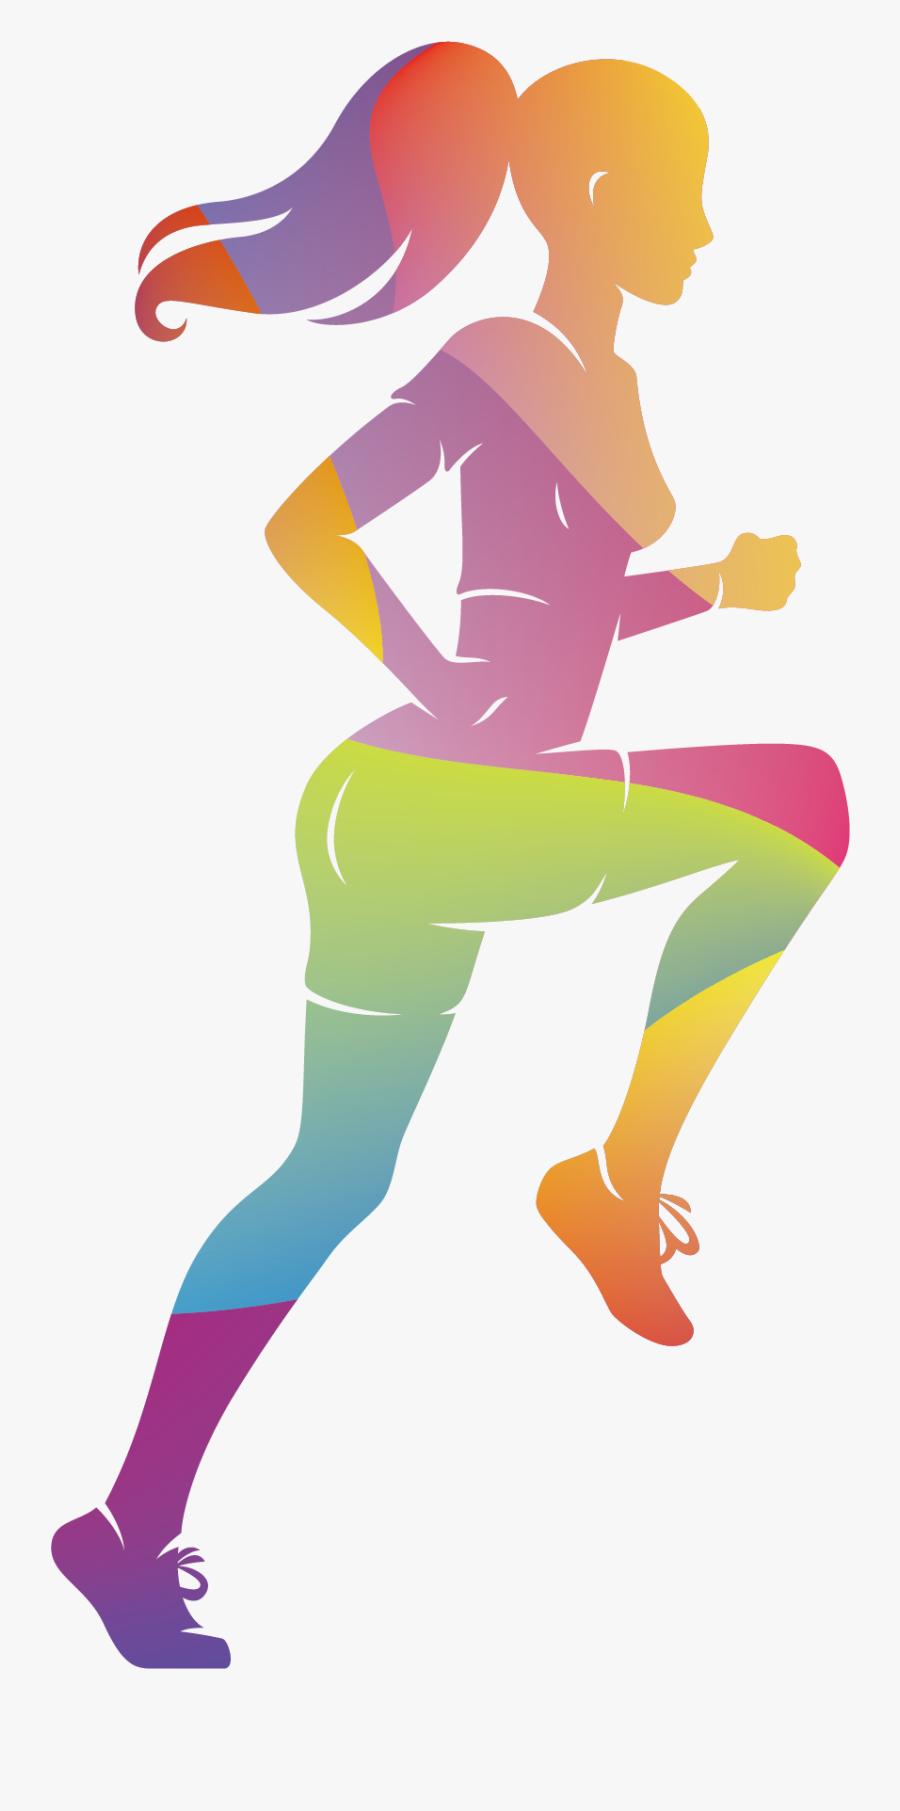 Running Athlete Sport - Running Athlete Clip Art, Transparent Clipart